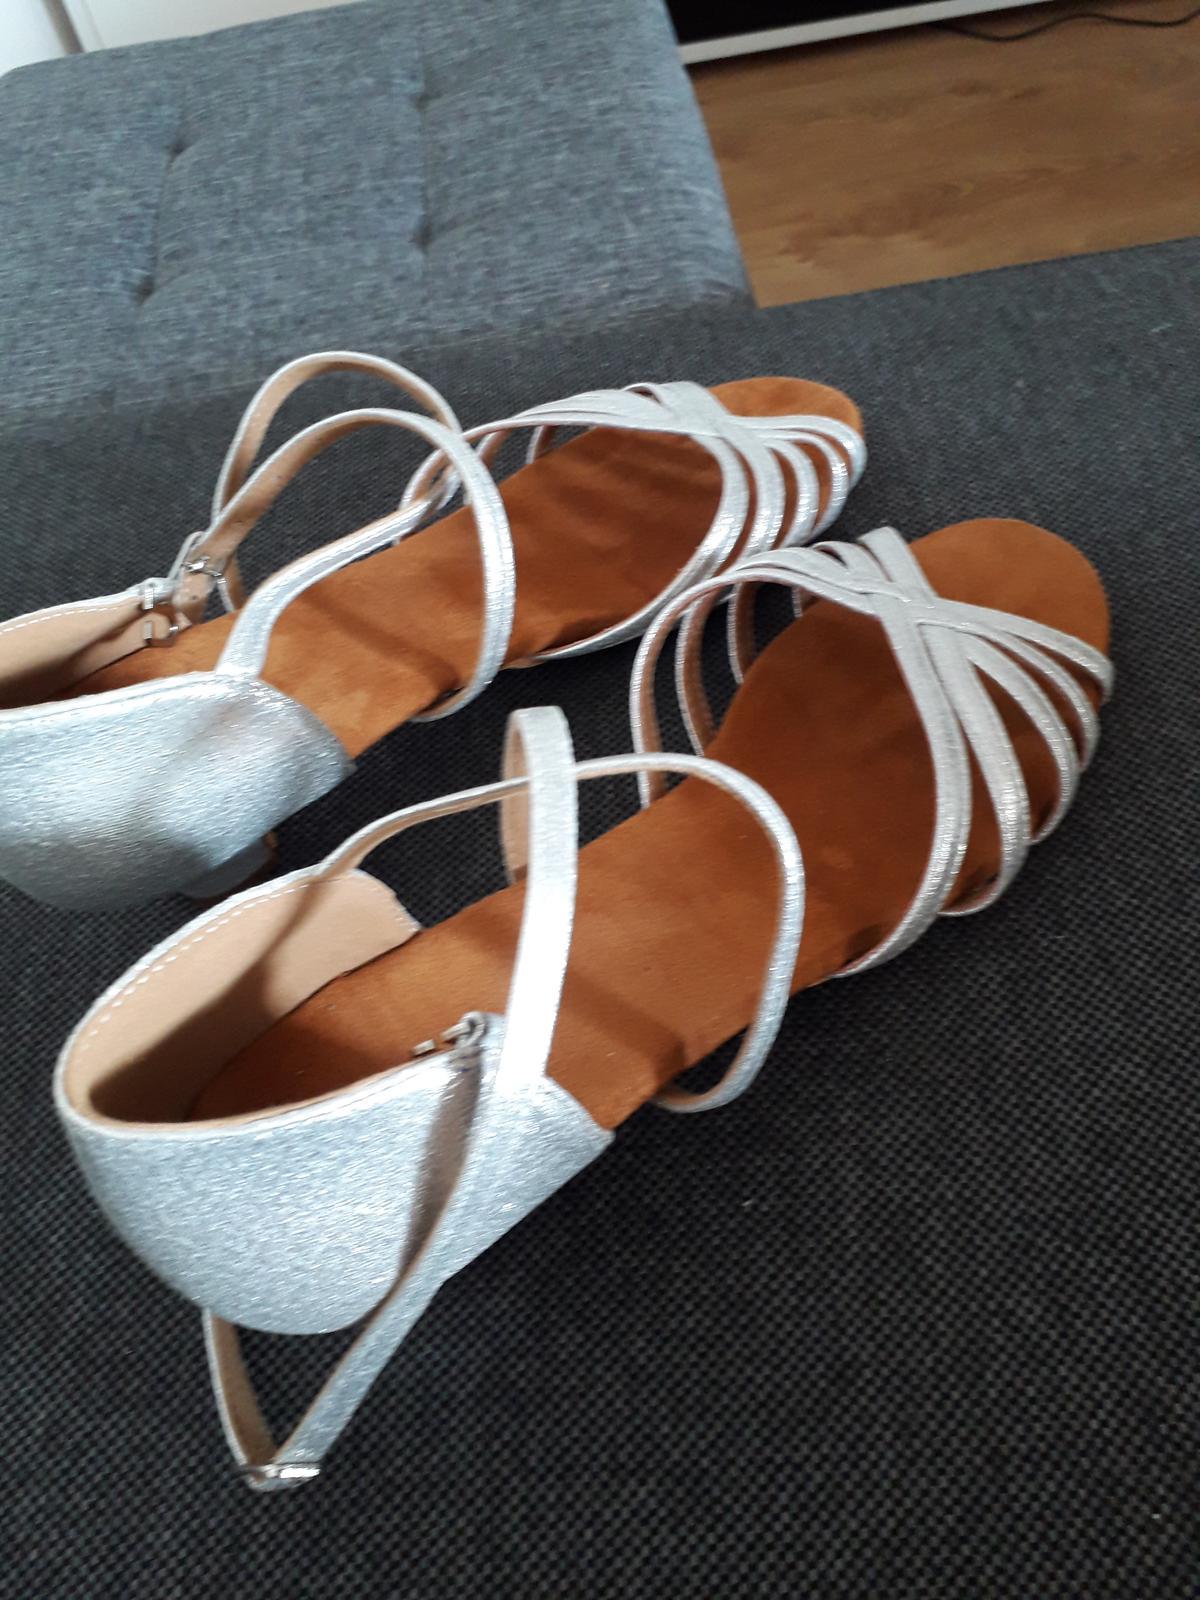 Sandále nízky opätok - Obrázok č. 2